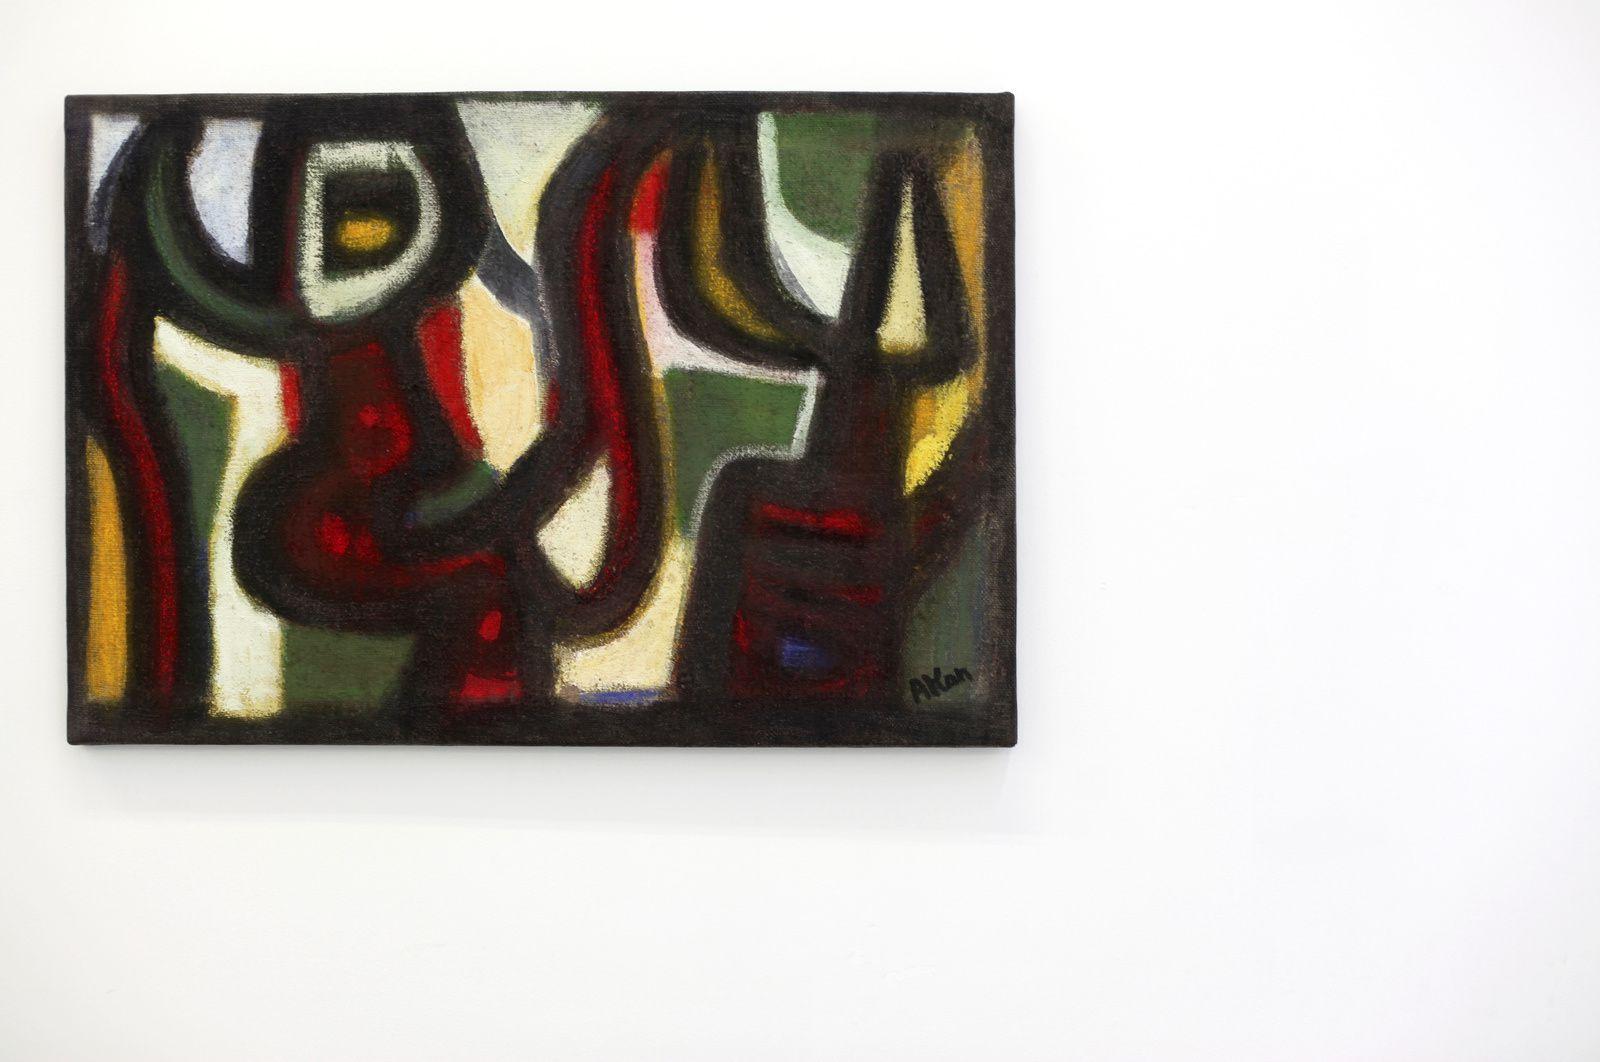 """Untitled"", 1958 de Jean Michel ATLAN - Courtesy Galerie Frank Elbaz © Photo Éric Simon"